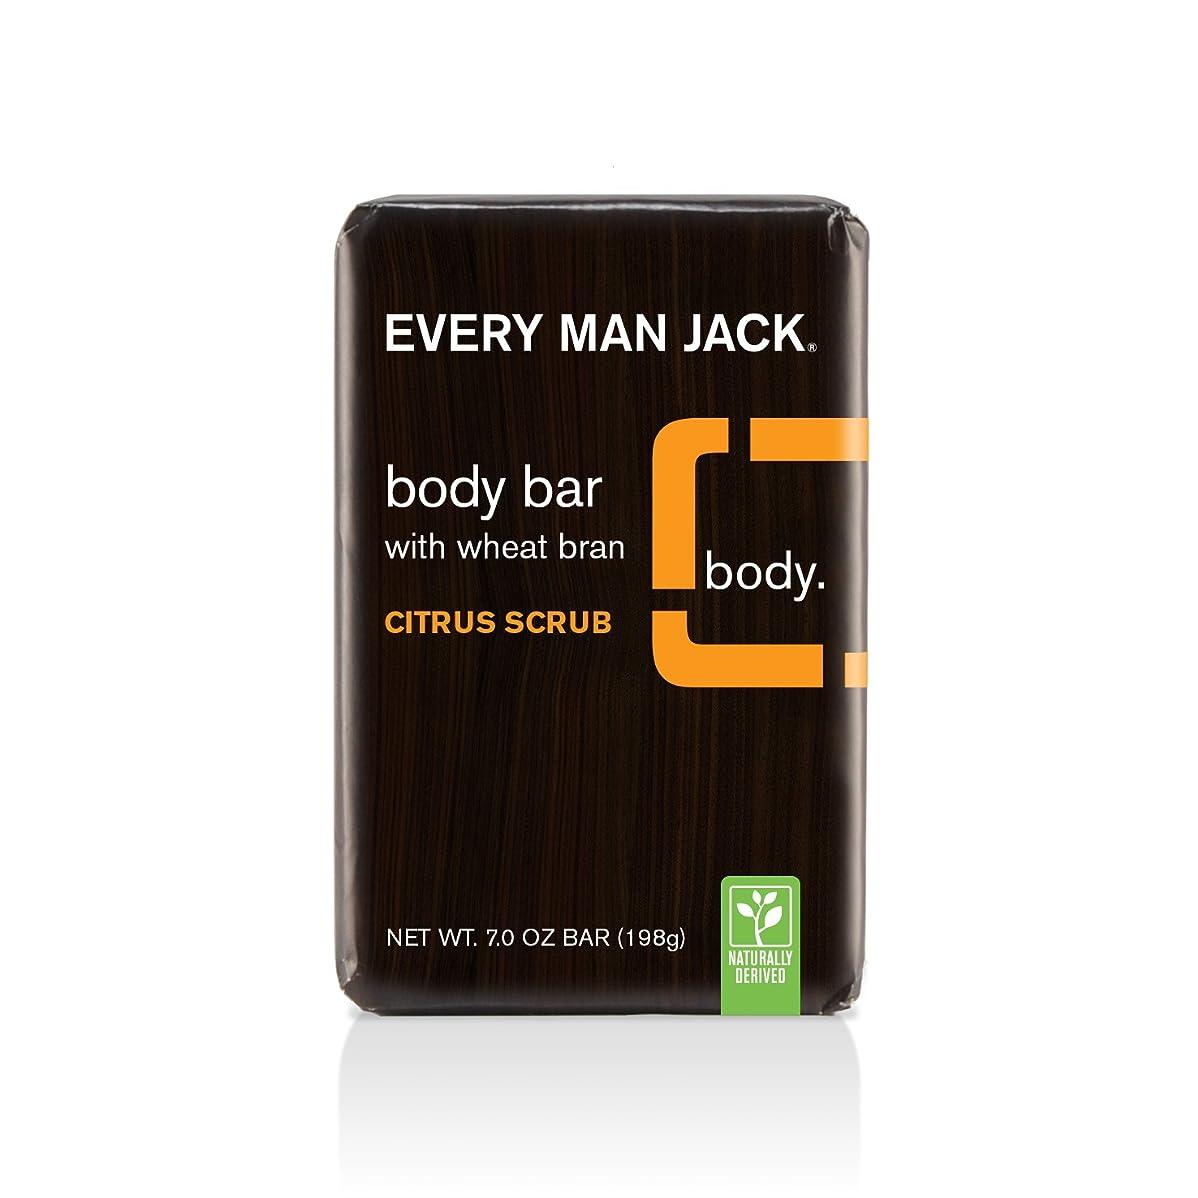 潜在的な重荷独特の海外直送品Body Bar Soap, Citrus Scrub 7 oz by Every Man Jack